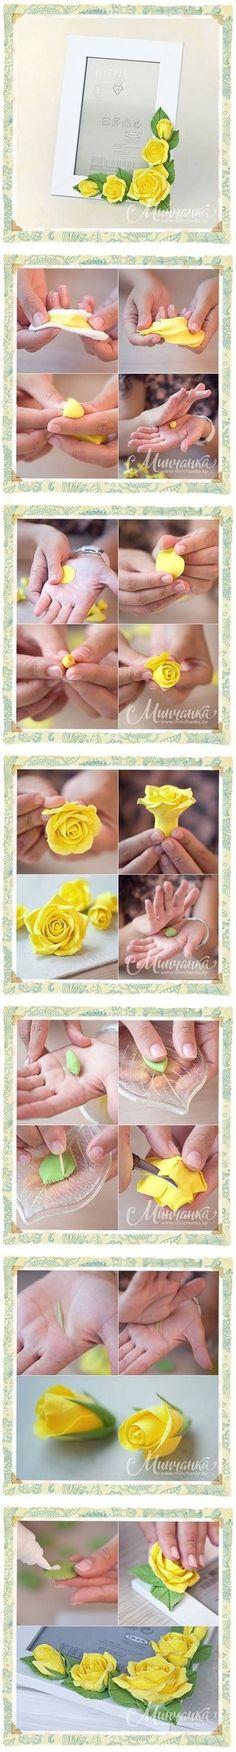 DIY Clay Rose diy craft crafts easy crafts craft idea diy ideas home diy diy flowers easy diy home crafts diy craft craft flowers